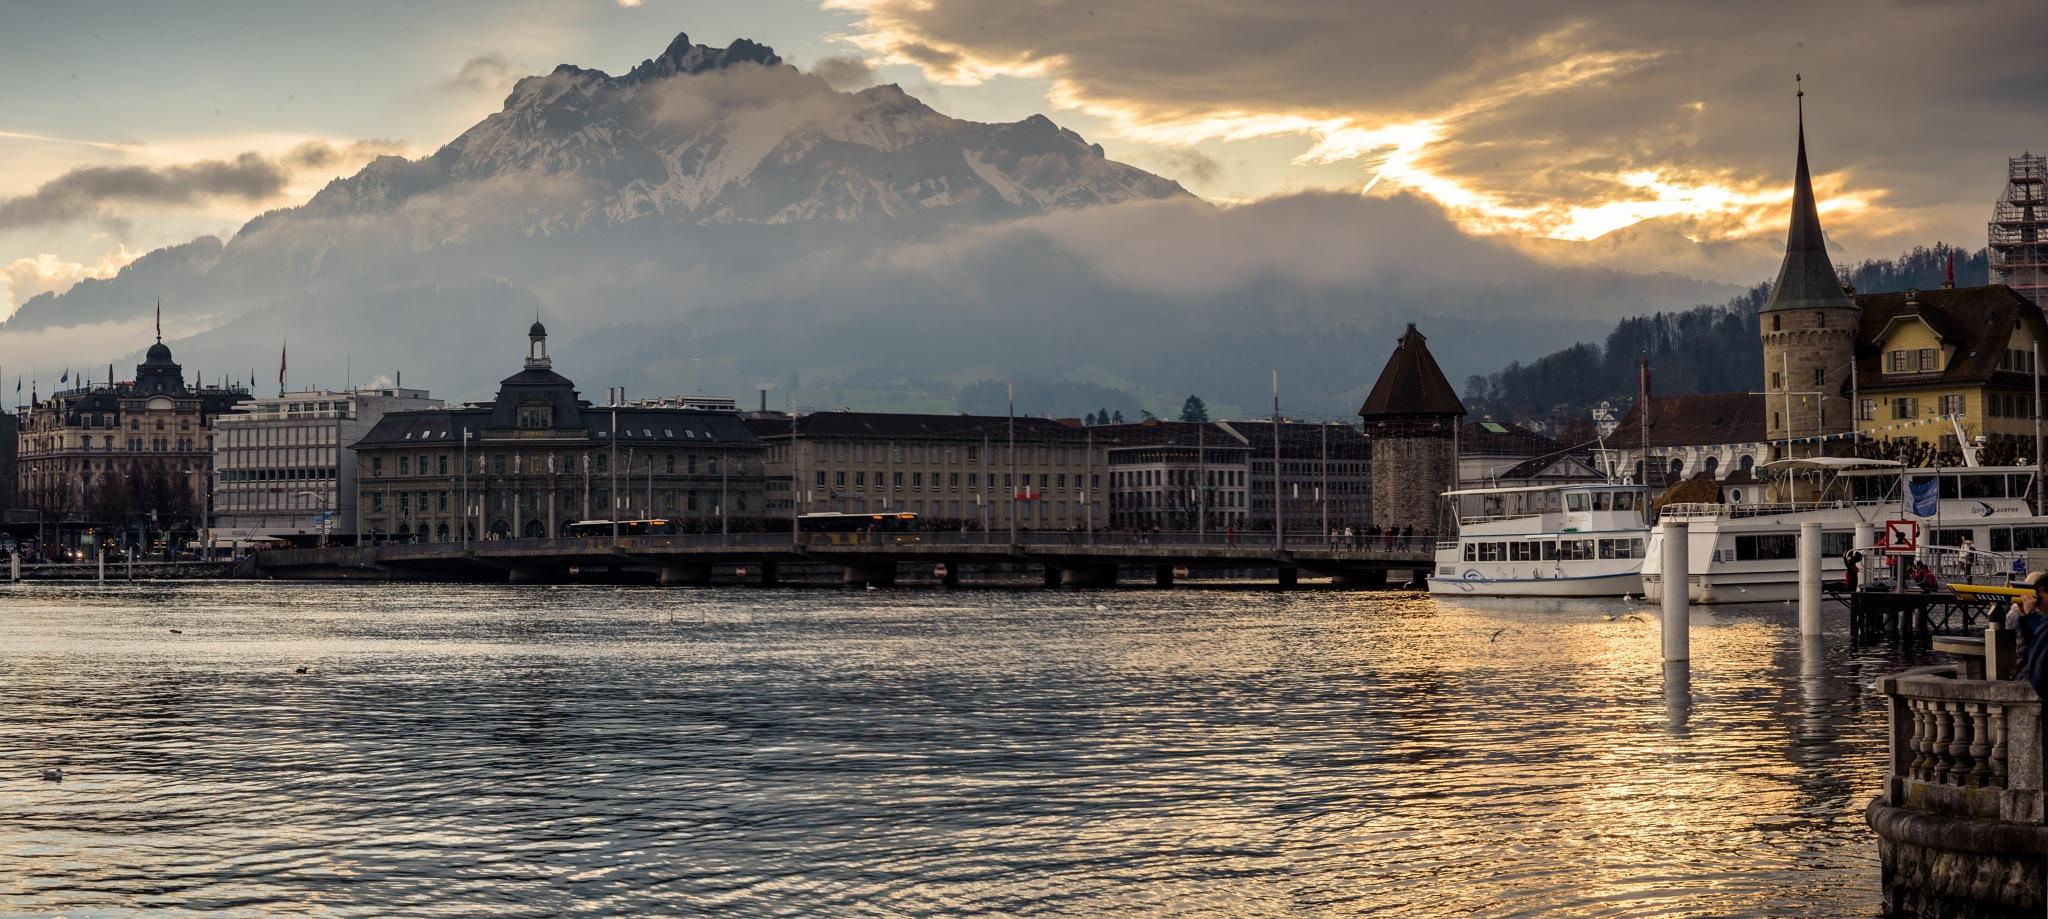 City Of Lucerne by Avedis